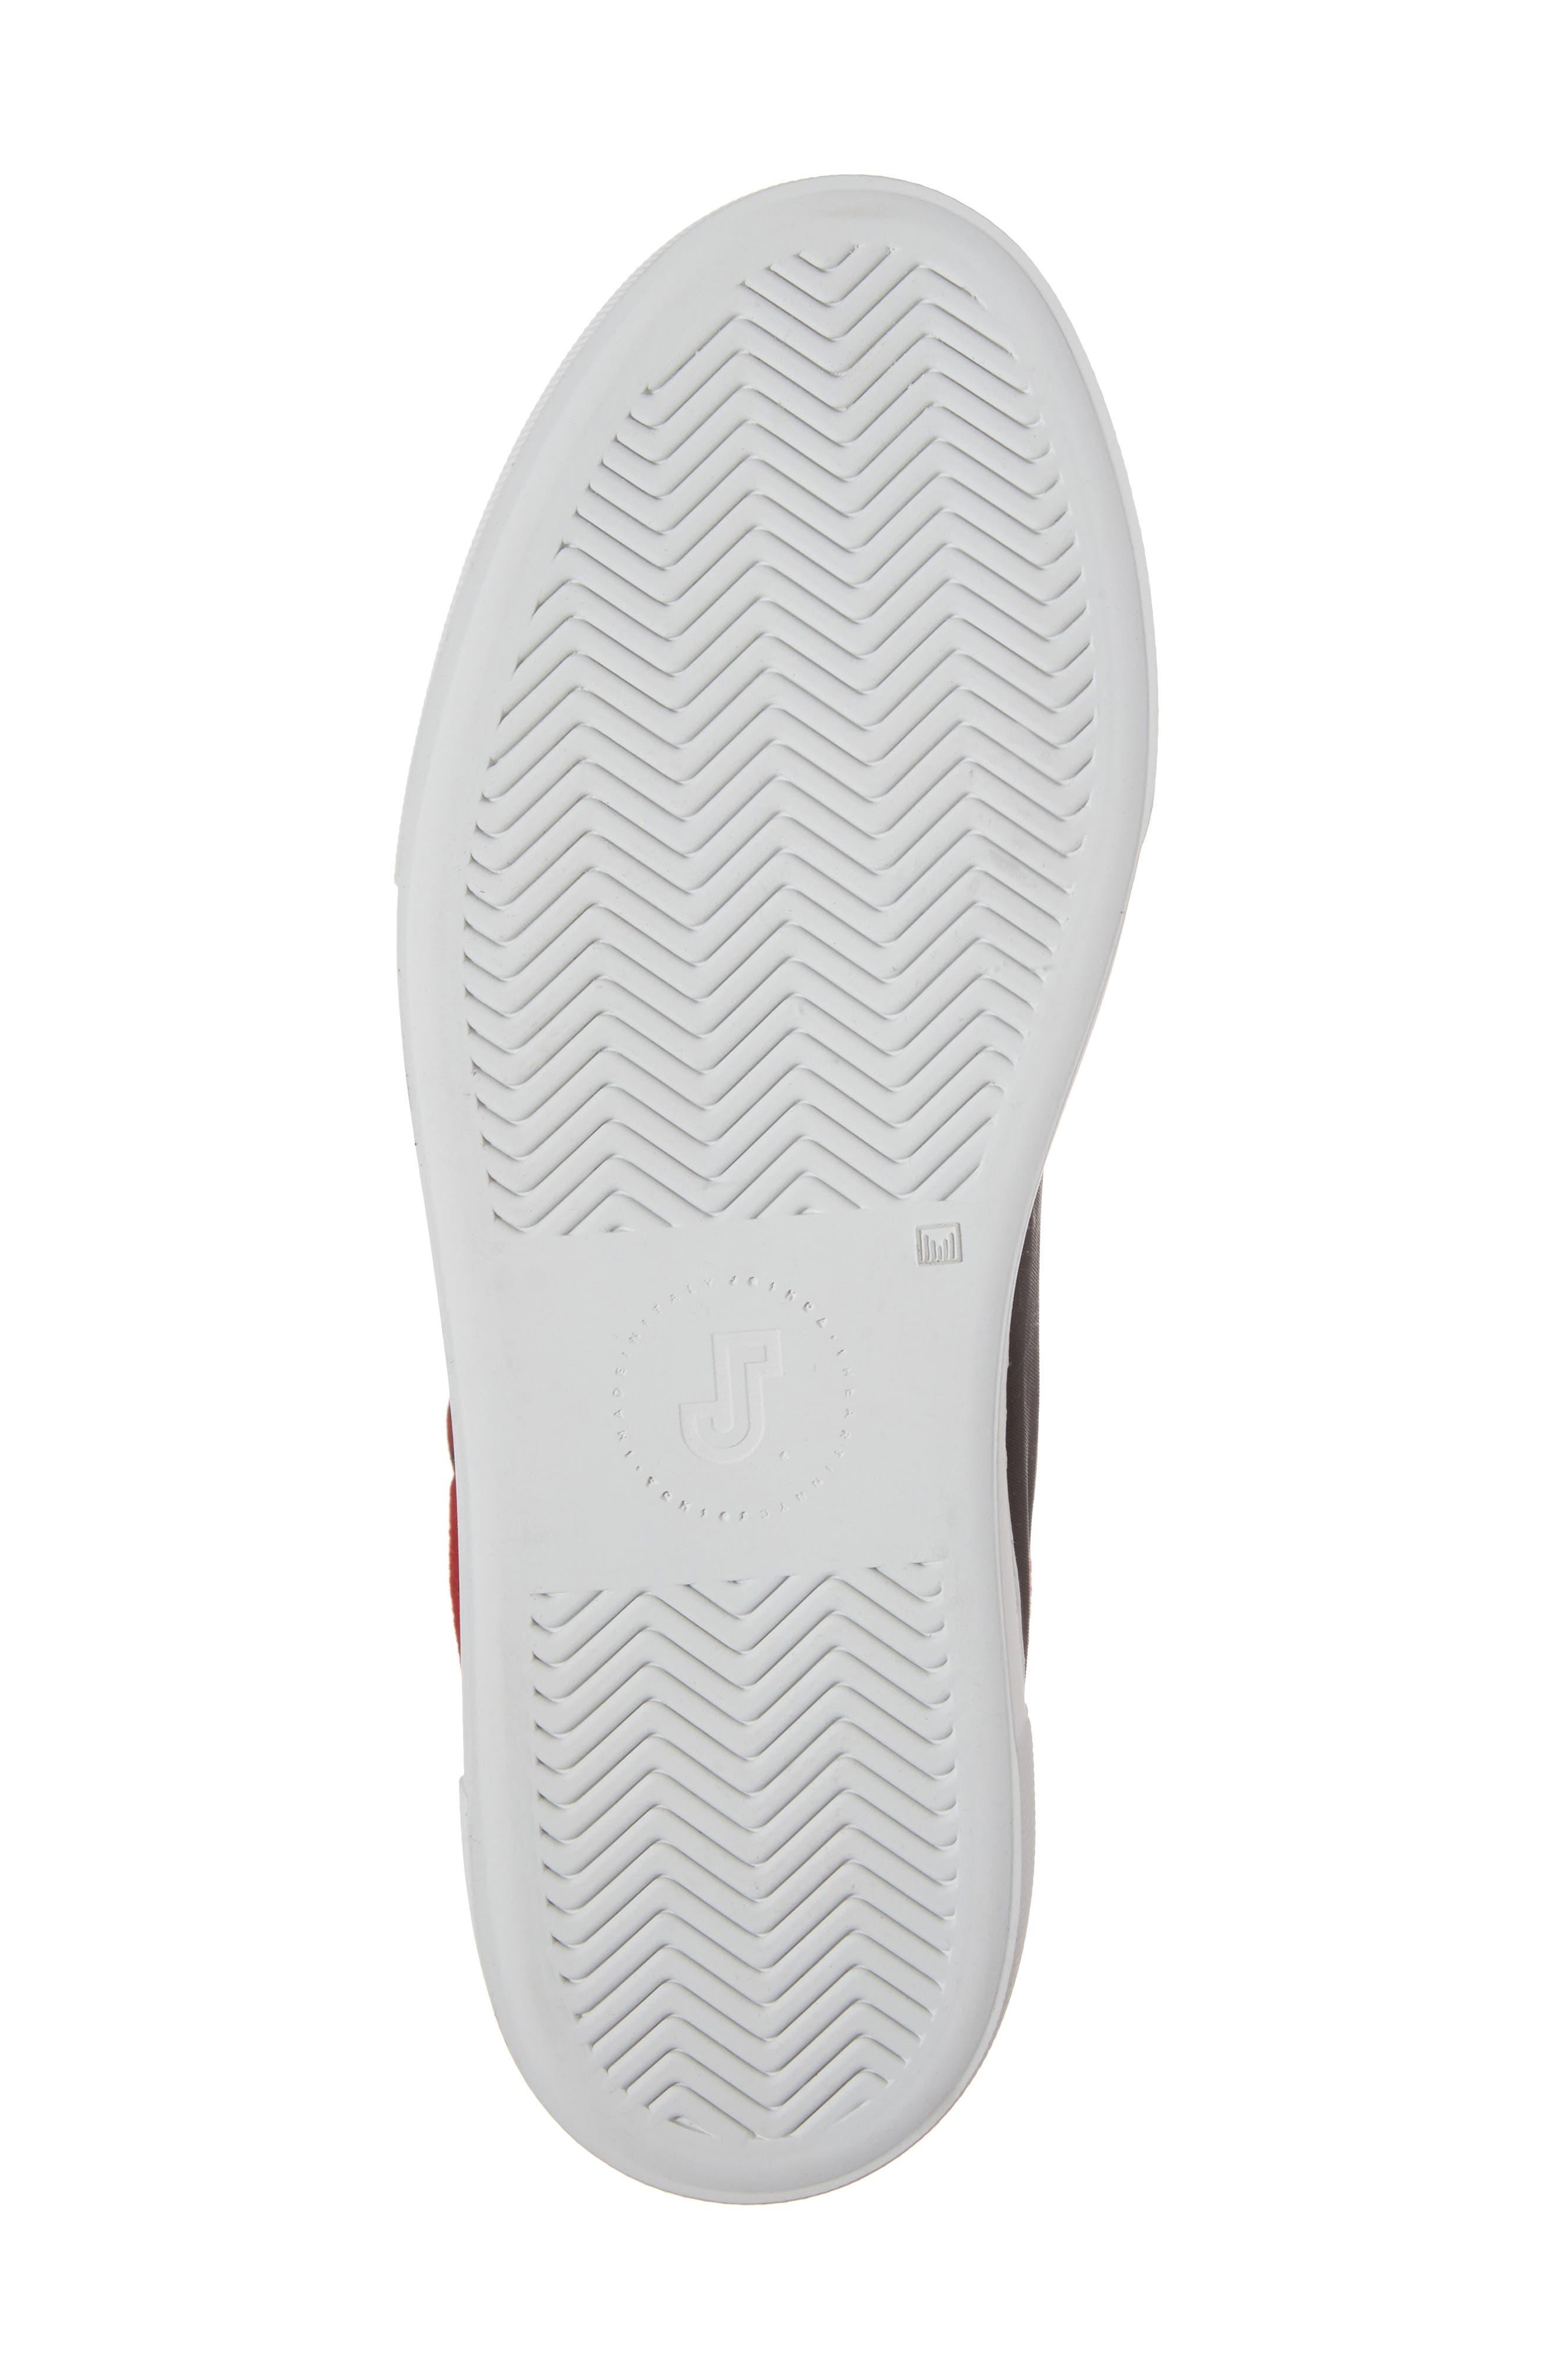 Bandana High Top Sneaker,                             Alternate thumbnail 6, color,                             001